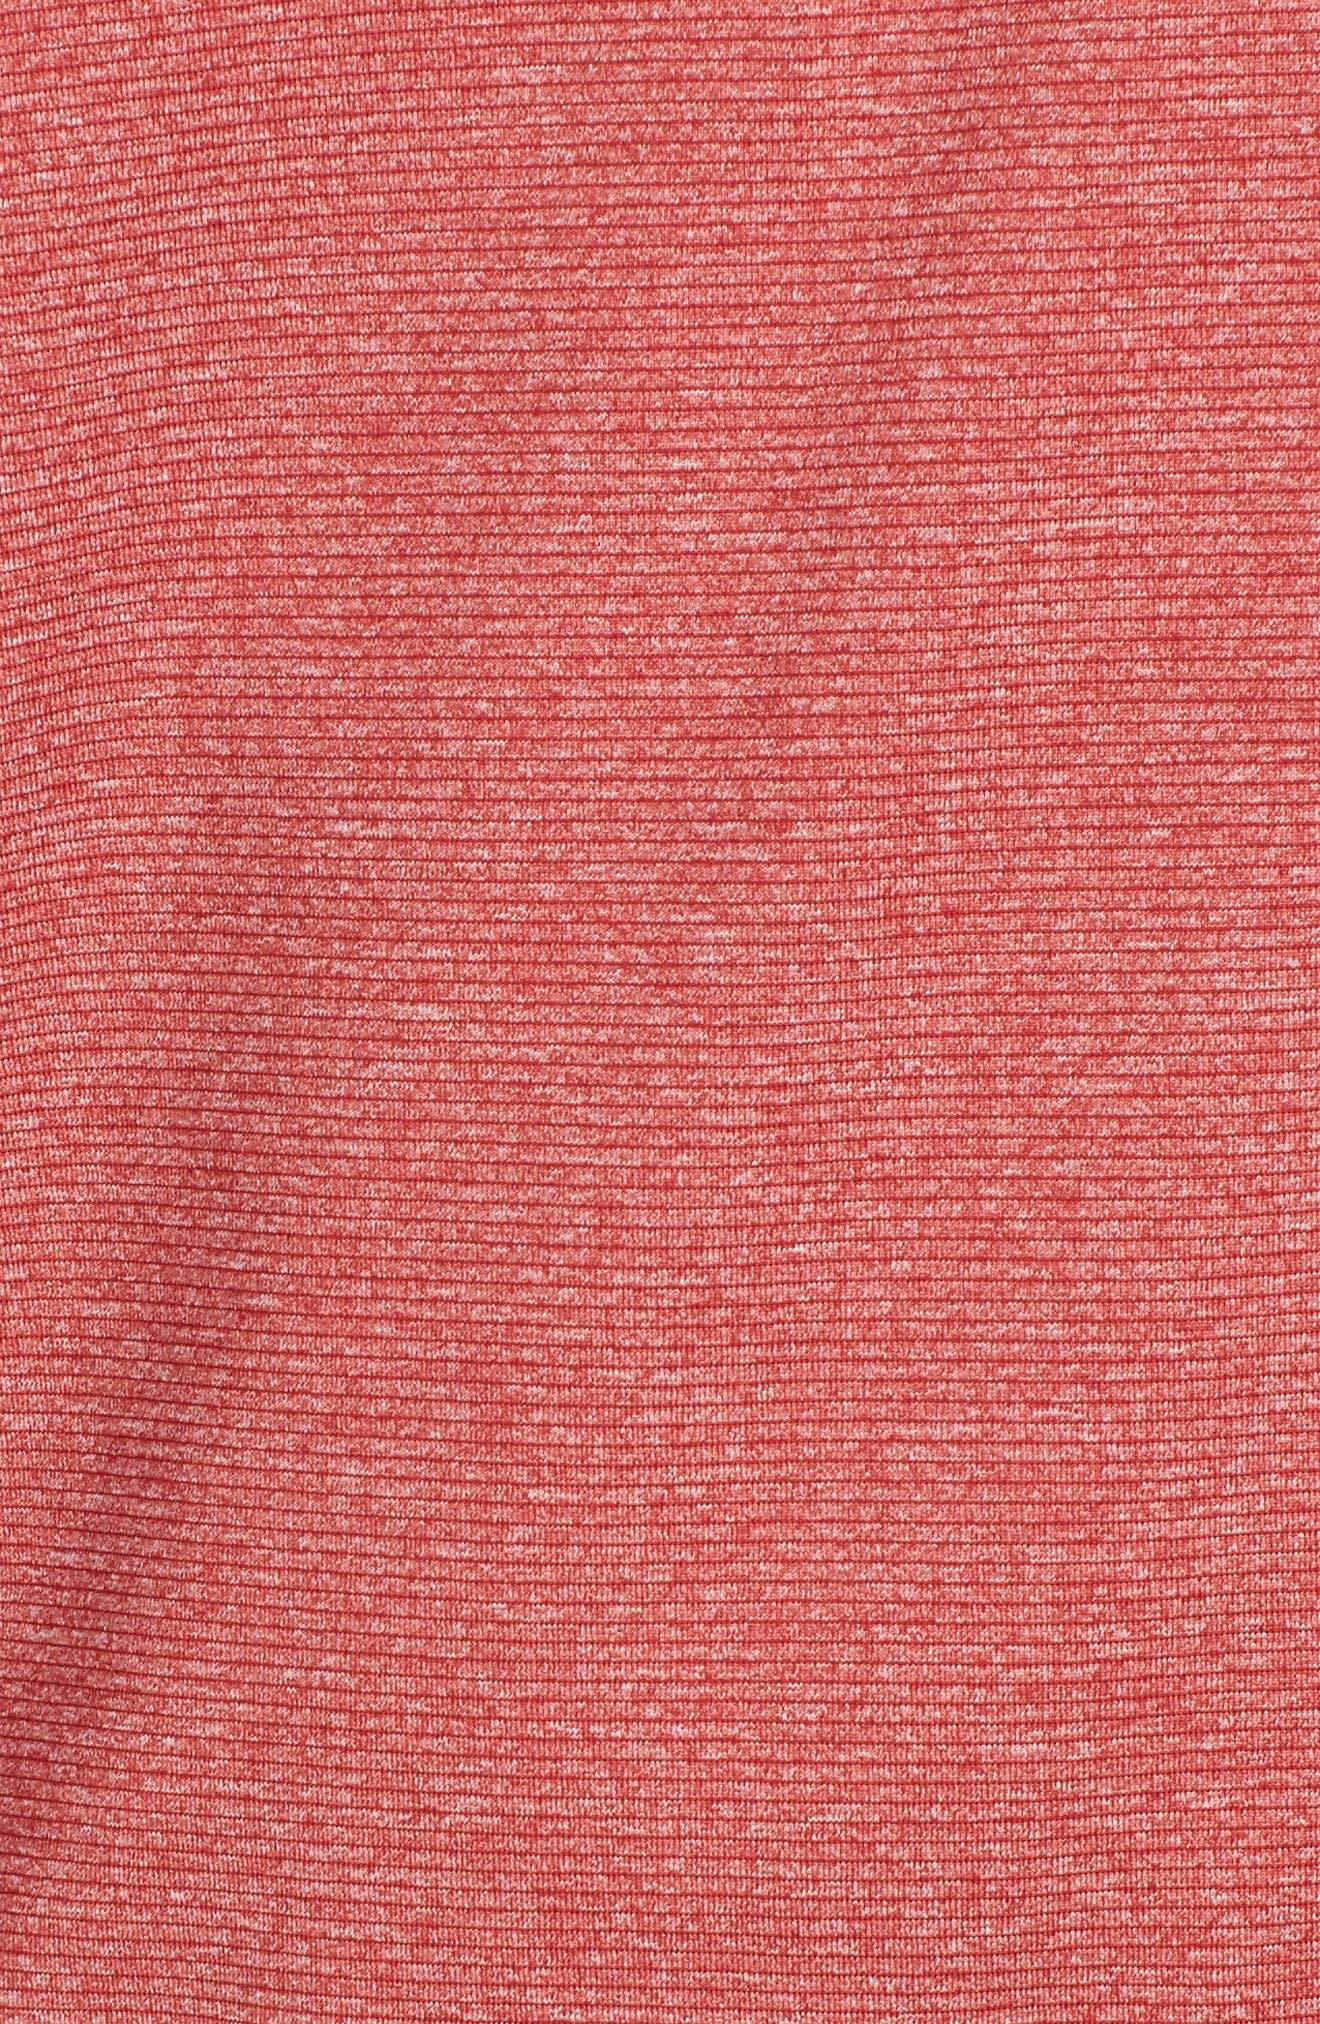 Shoreline - Tampa Bay Buccaneers Half Zip Pullover,                             Alternate thumbnail 5, color,                             Cardinal Red Heather